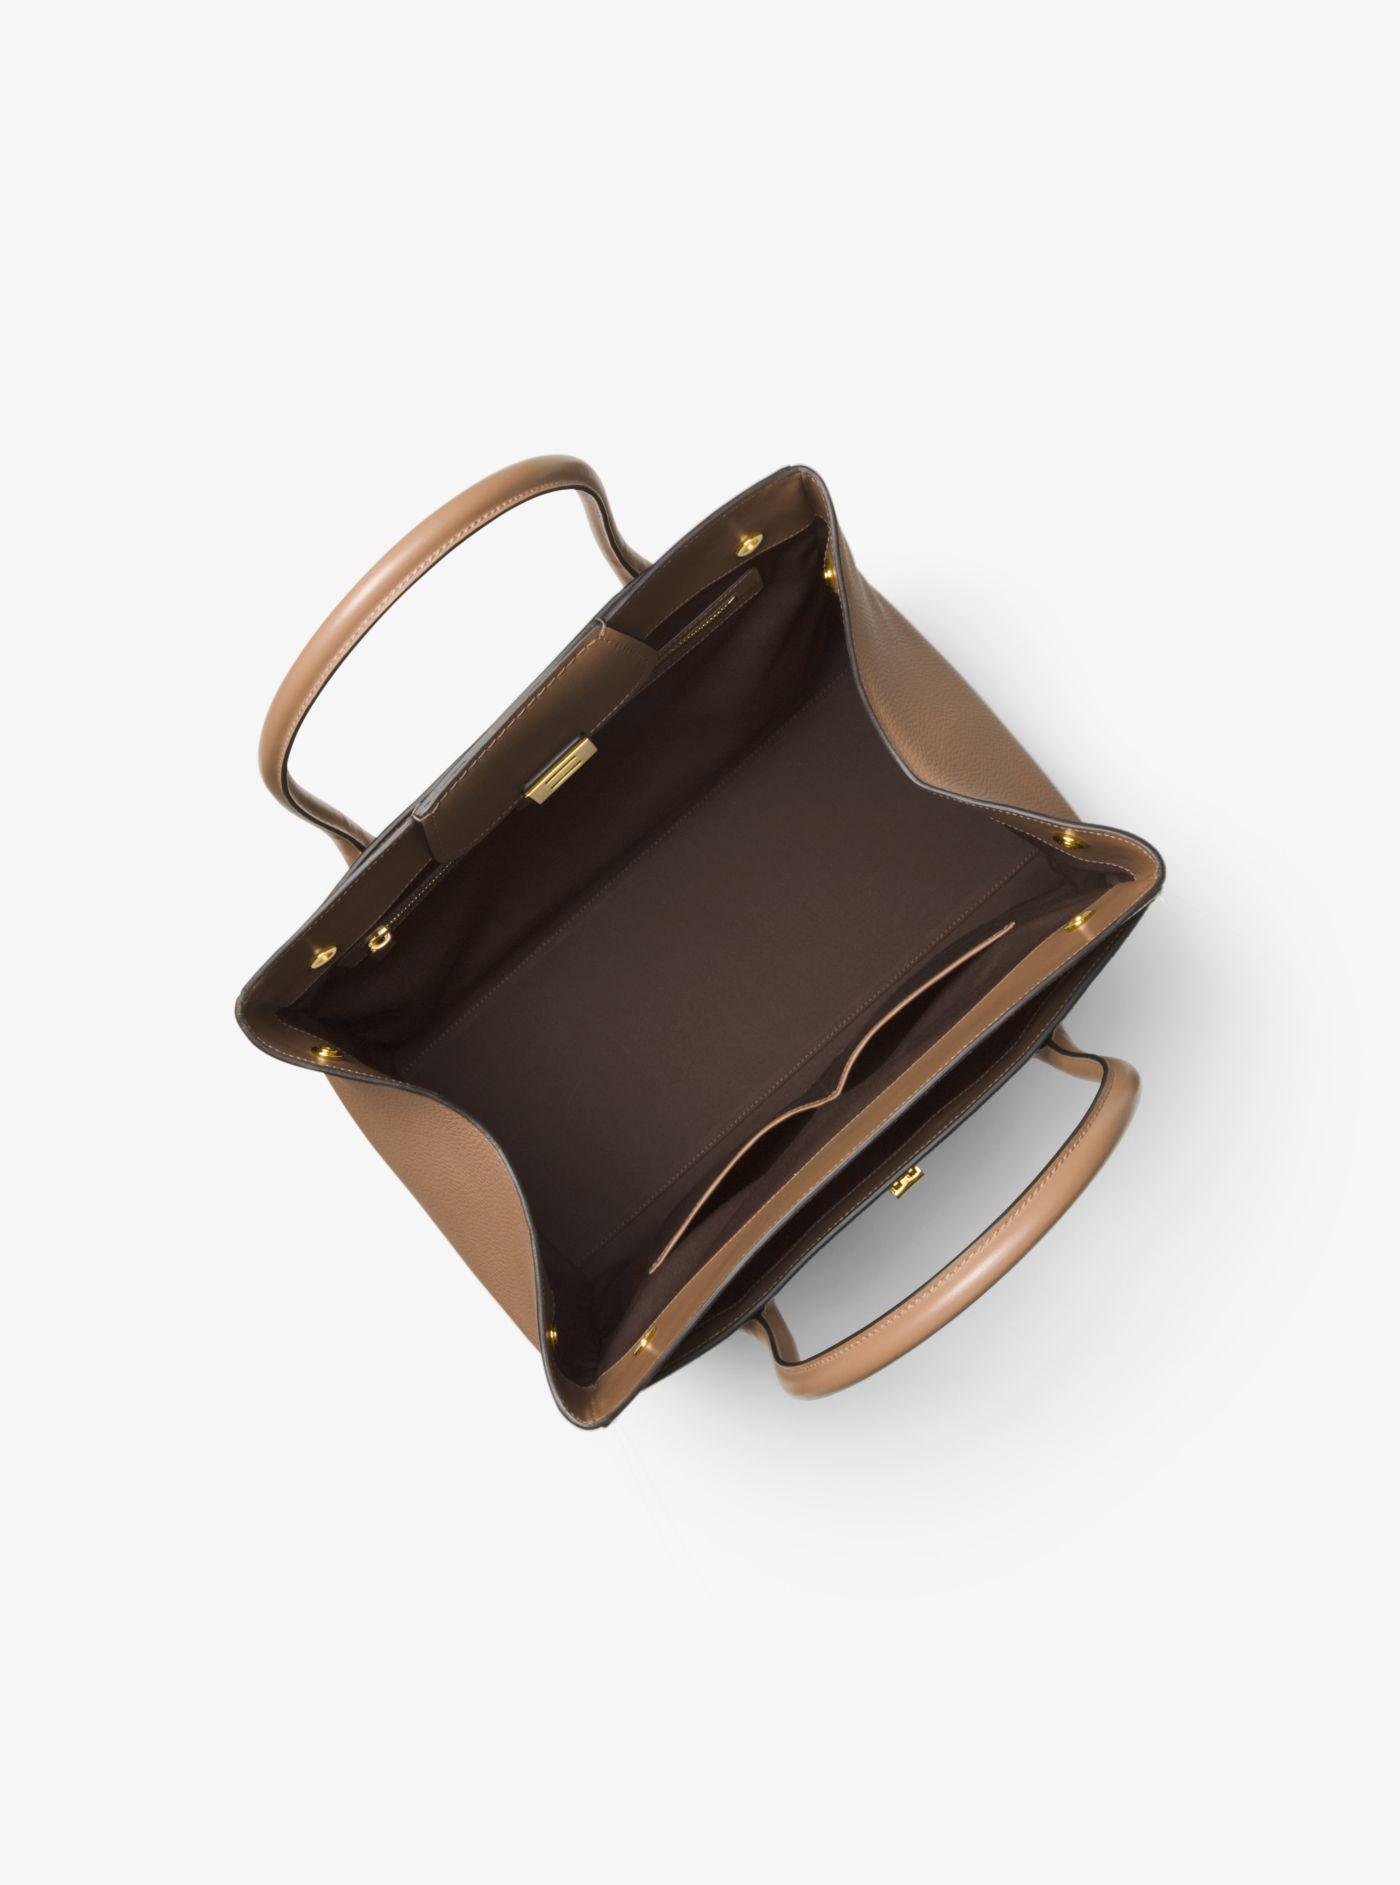 57c5f7928e91 Michael Kors - Multicolor Bancroft Pebbled Calf Leather Weekender - Lyst.  View fullscreen